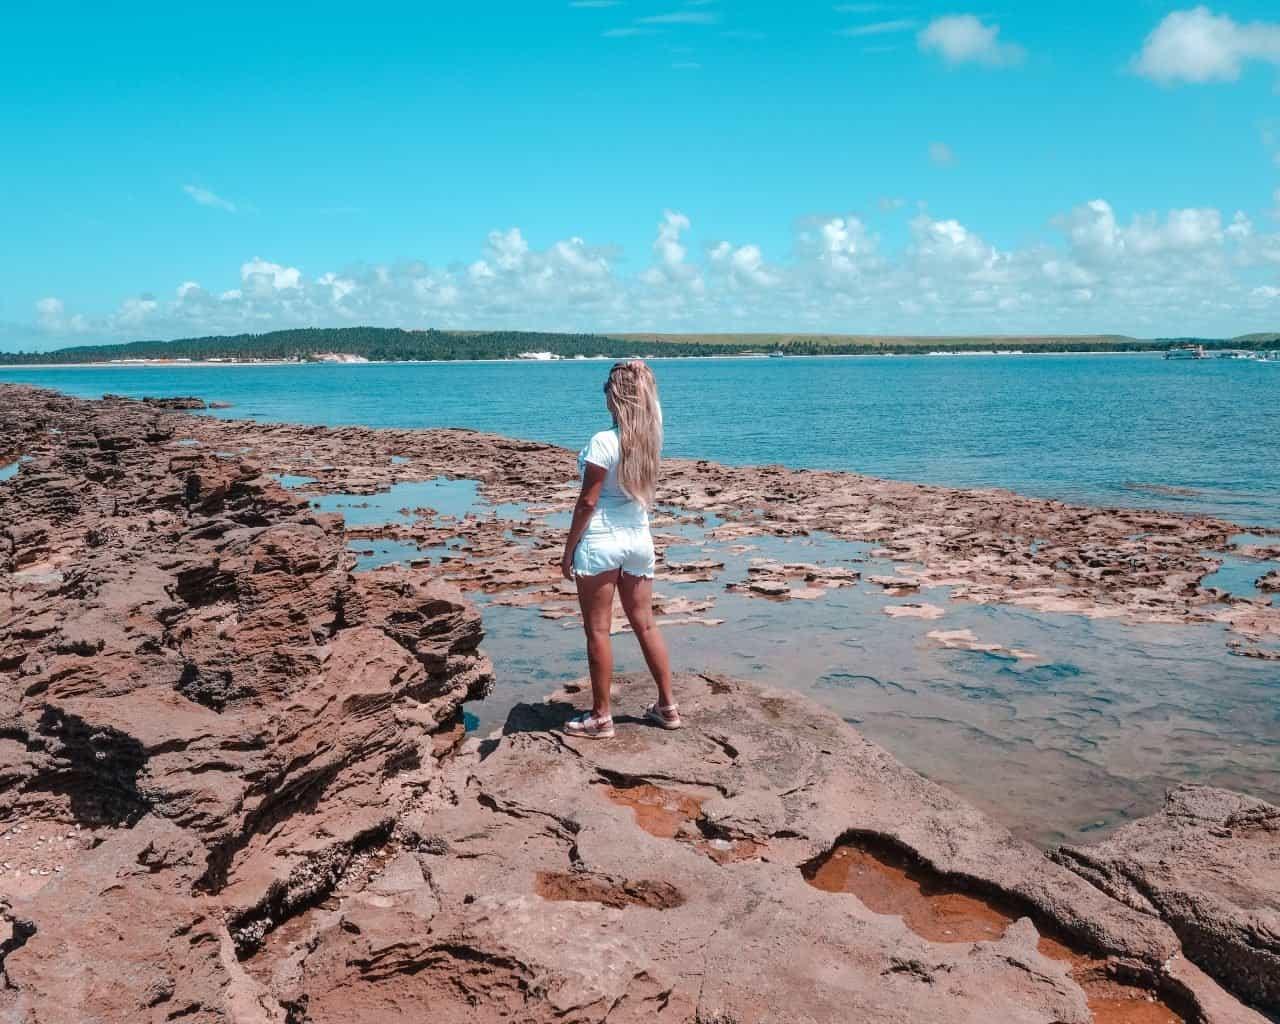 Lugares para visitar barato no Brasil